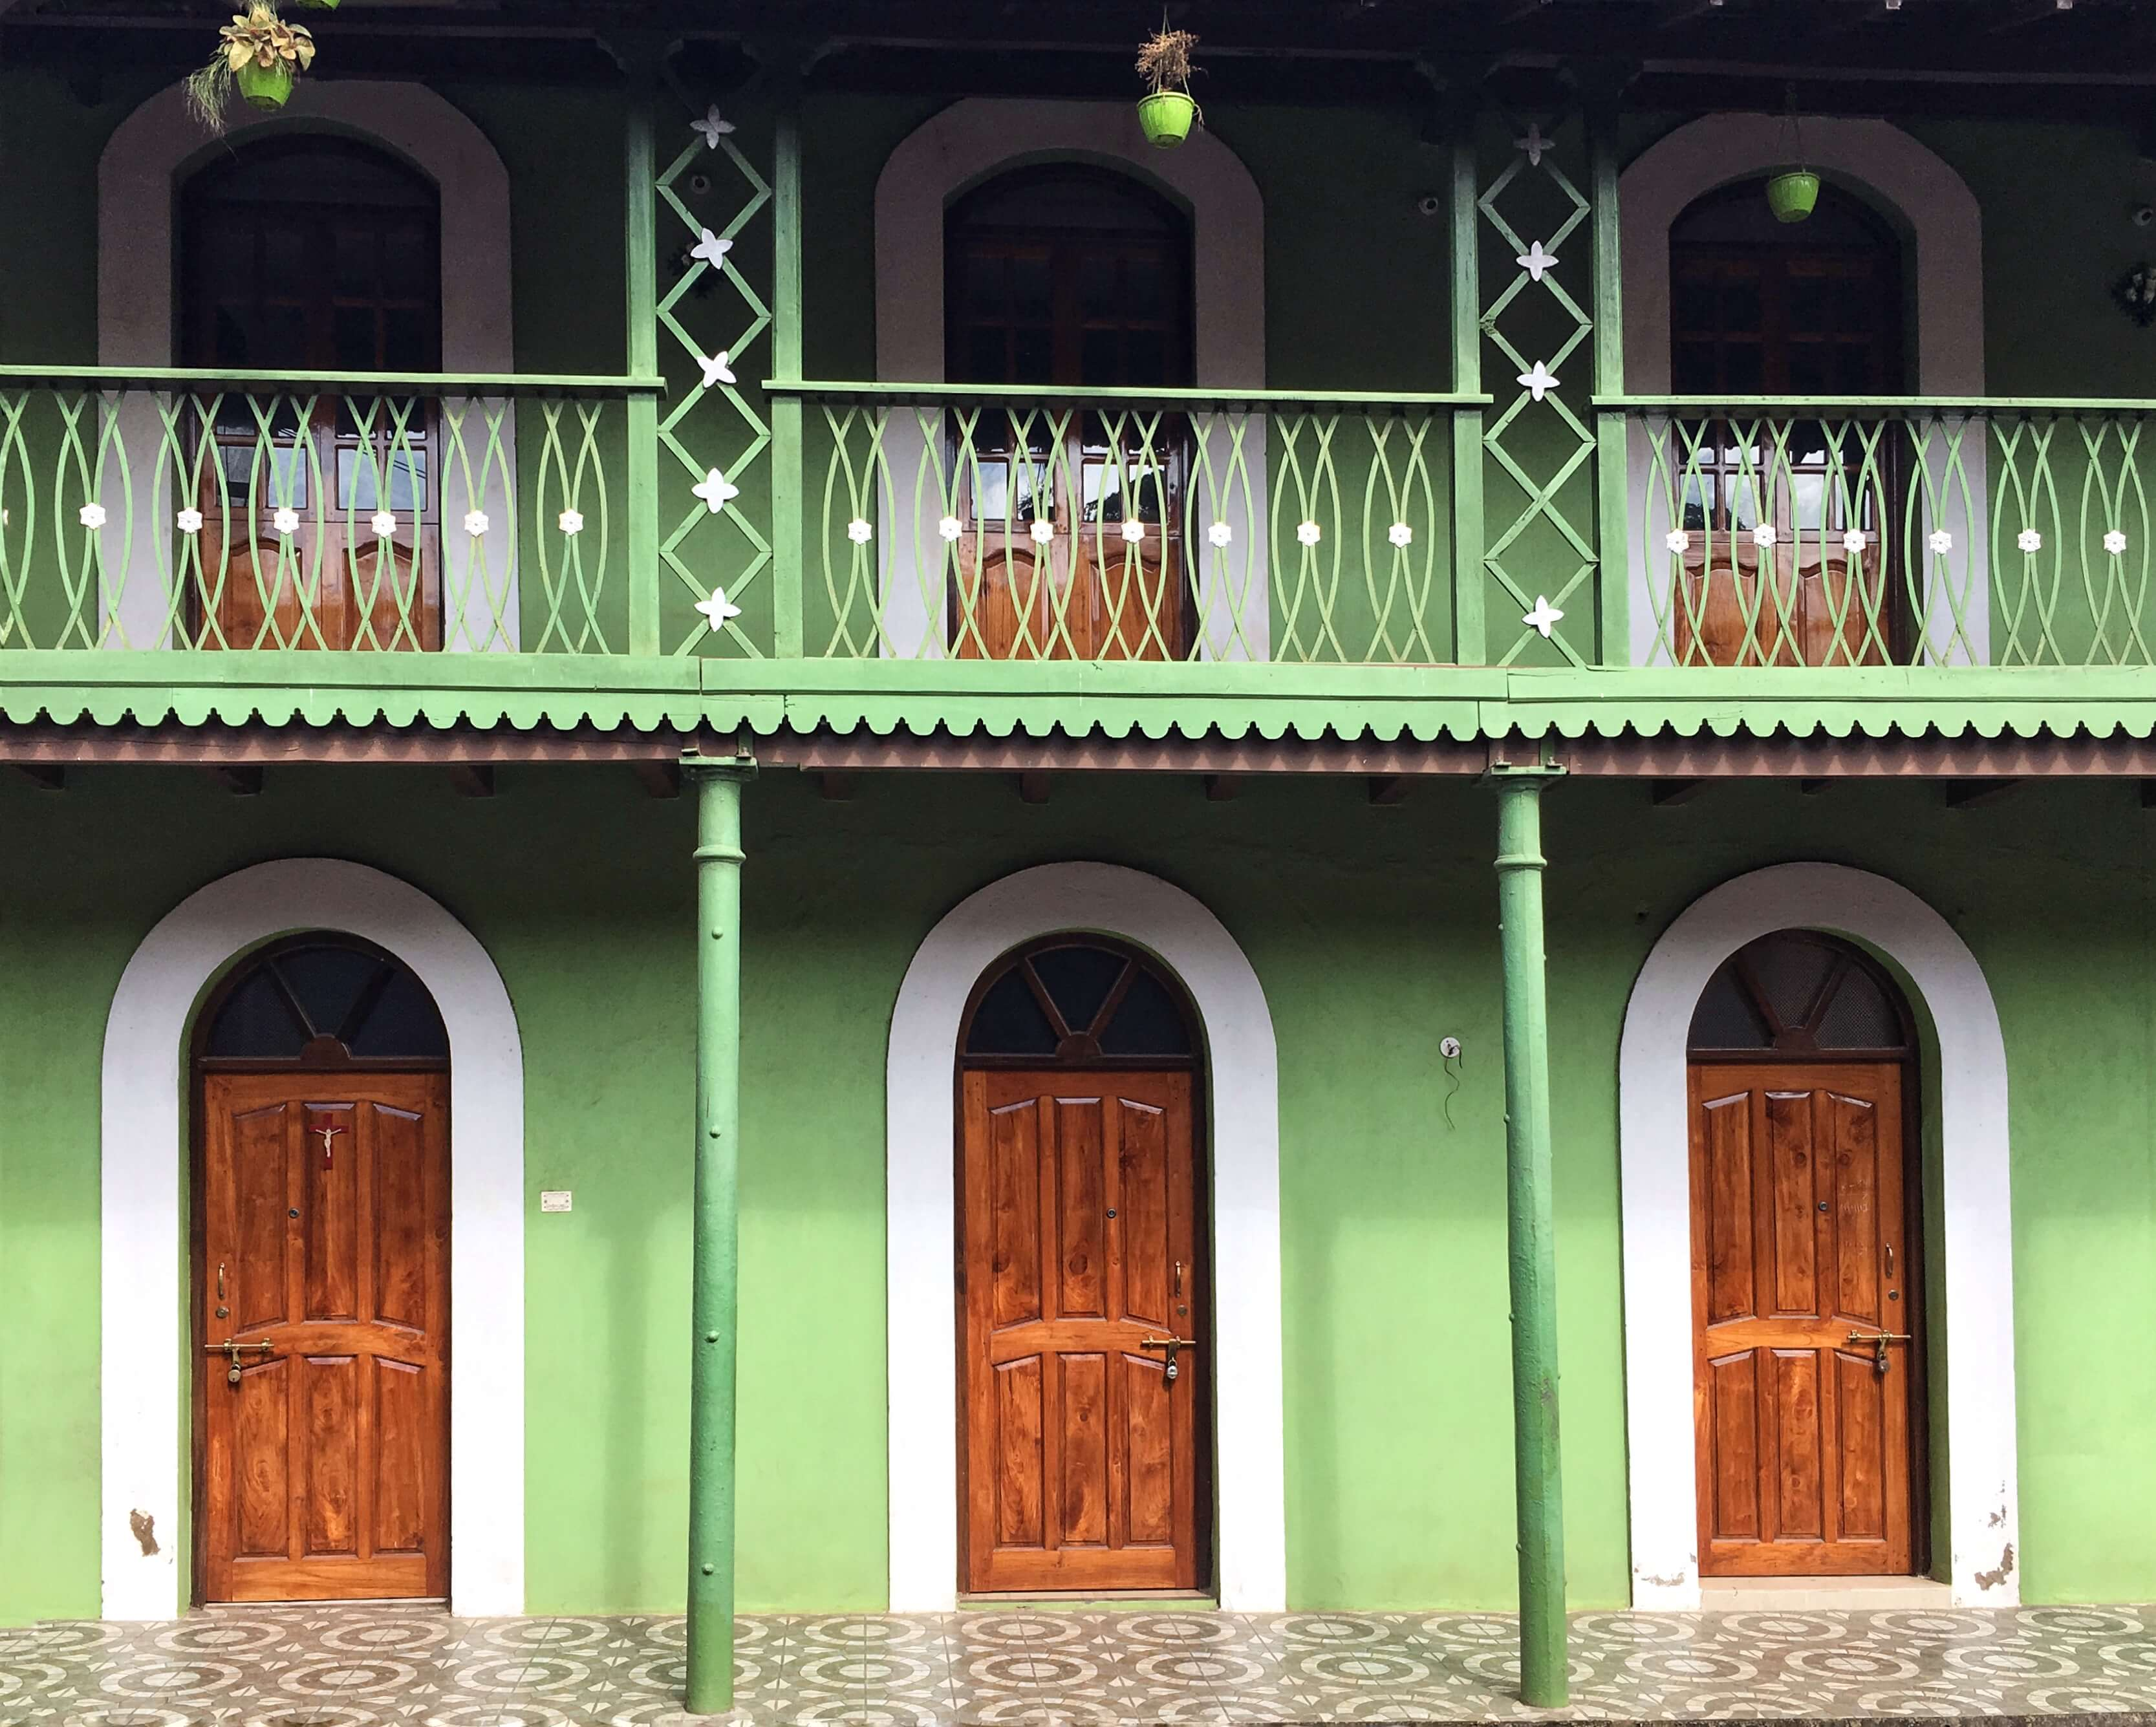 Green building with balcony in Panaji, Goa